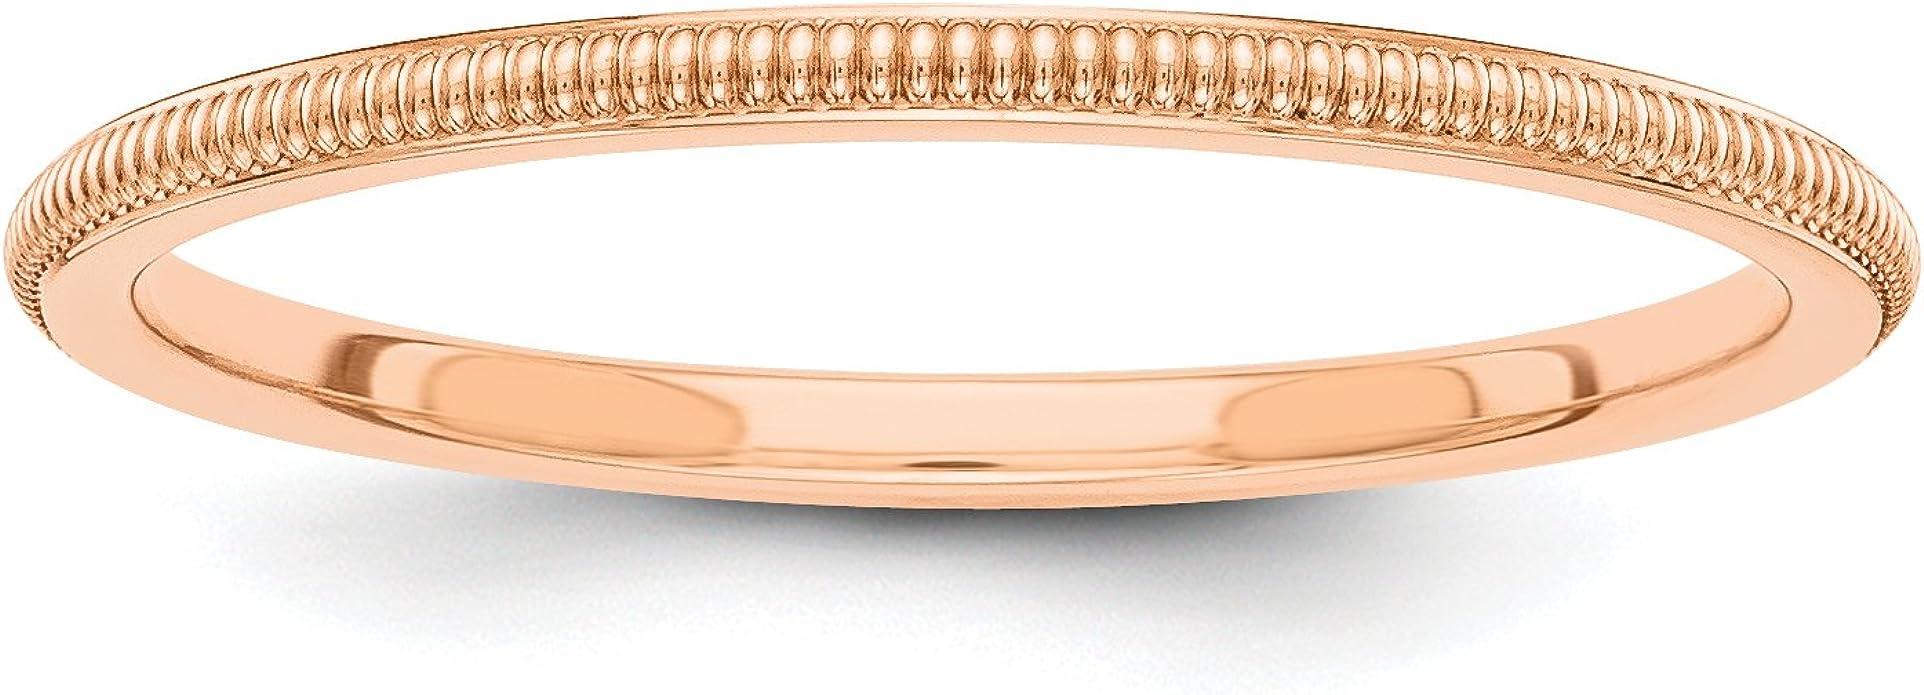 14k Rose Gold 3mm Milgrain Half-Round Men/'sLadies Wedding Band Ring